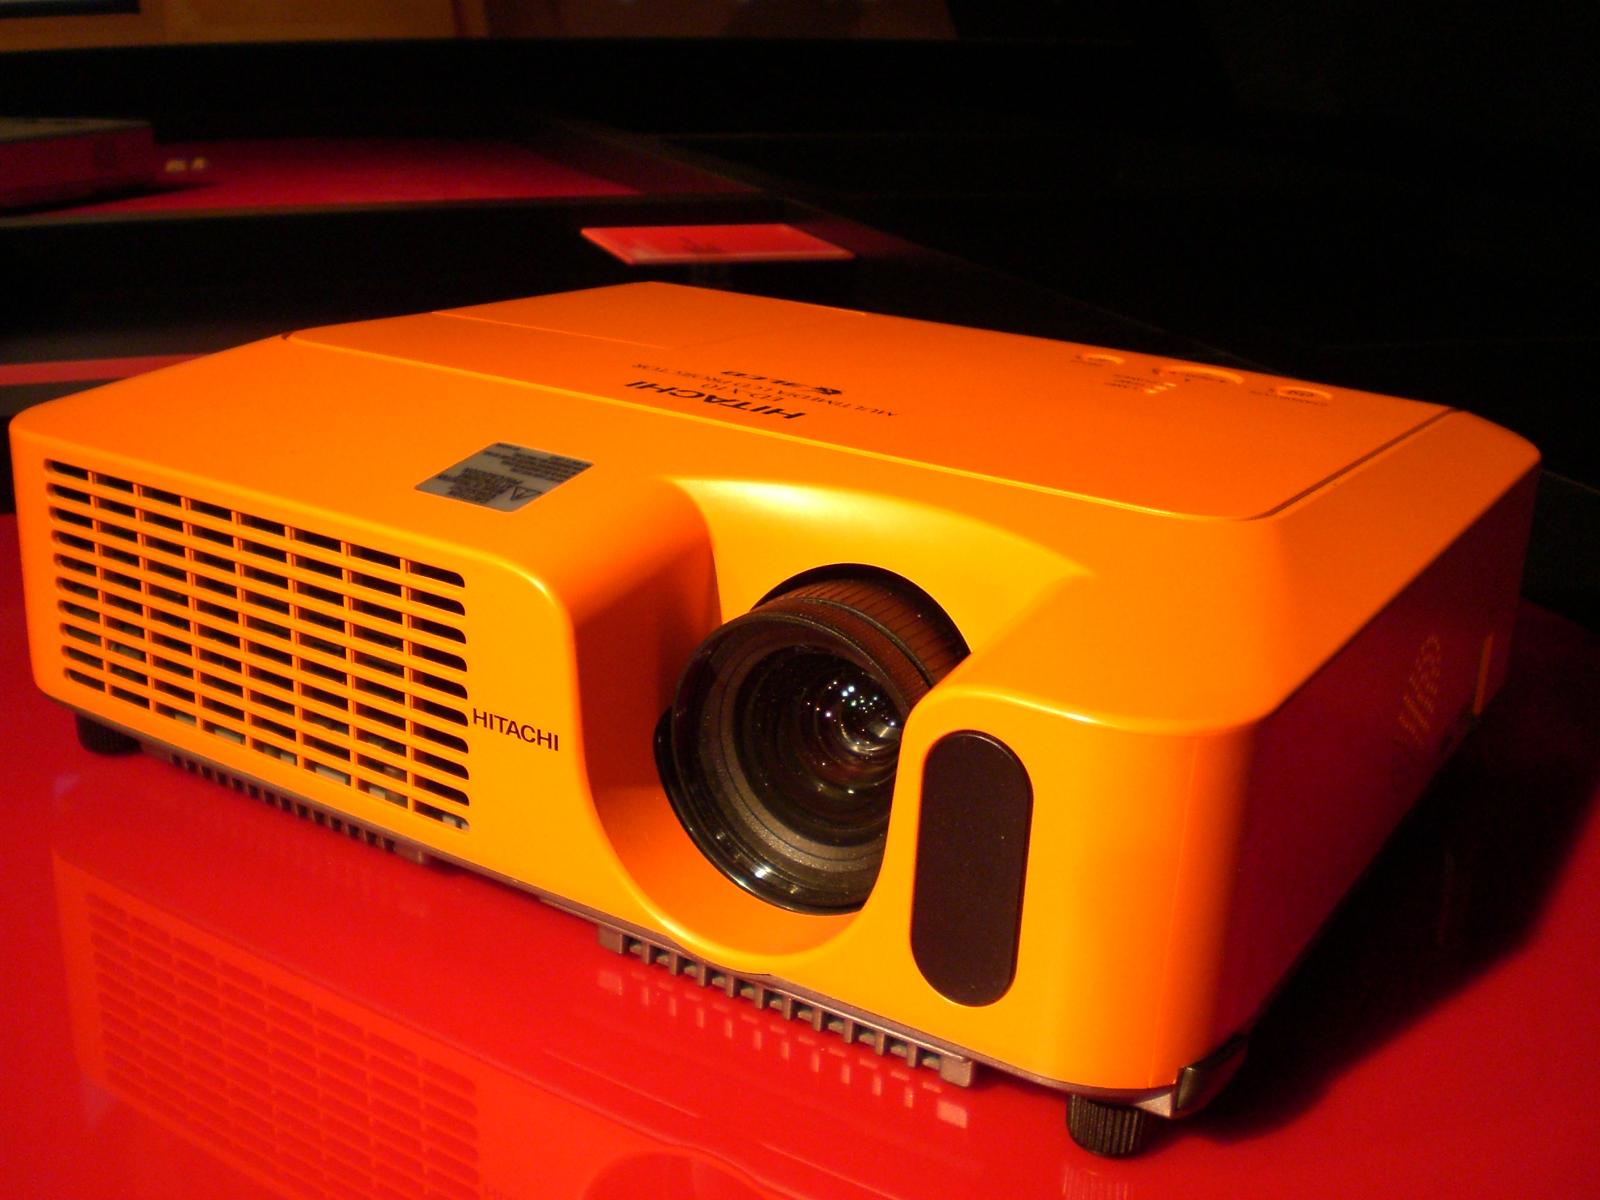 Hitachi Projektoren Ed X10 Xga Lcd Beamer Cp X4041wn Wifi Projector Projektor